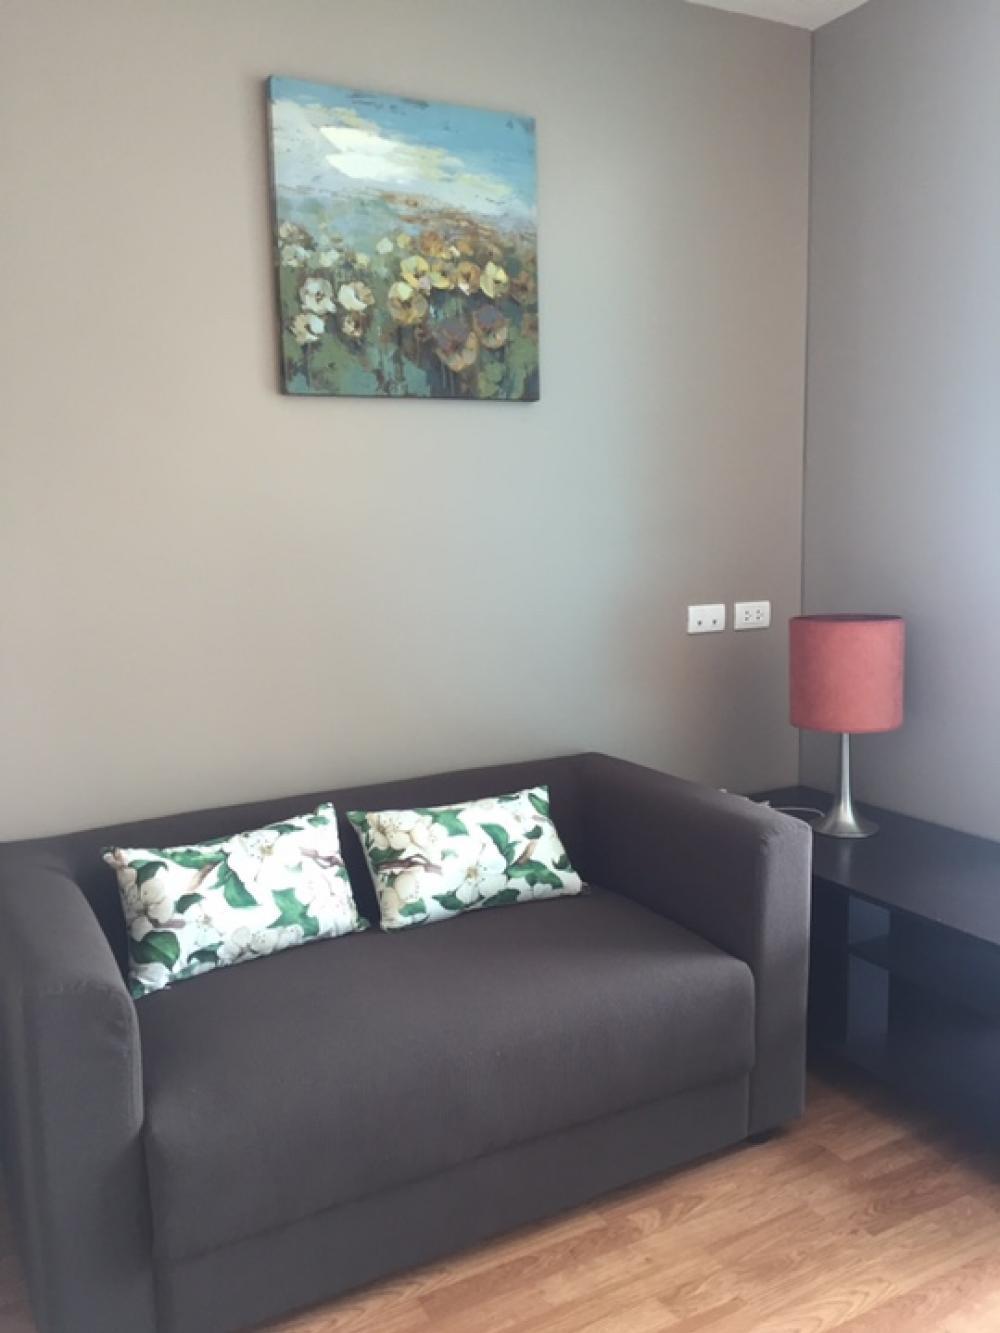 For RentCondoBang kae, Phetkasem : Condo for rent, Lumpini Petchkasem 98